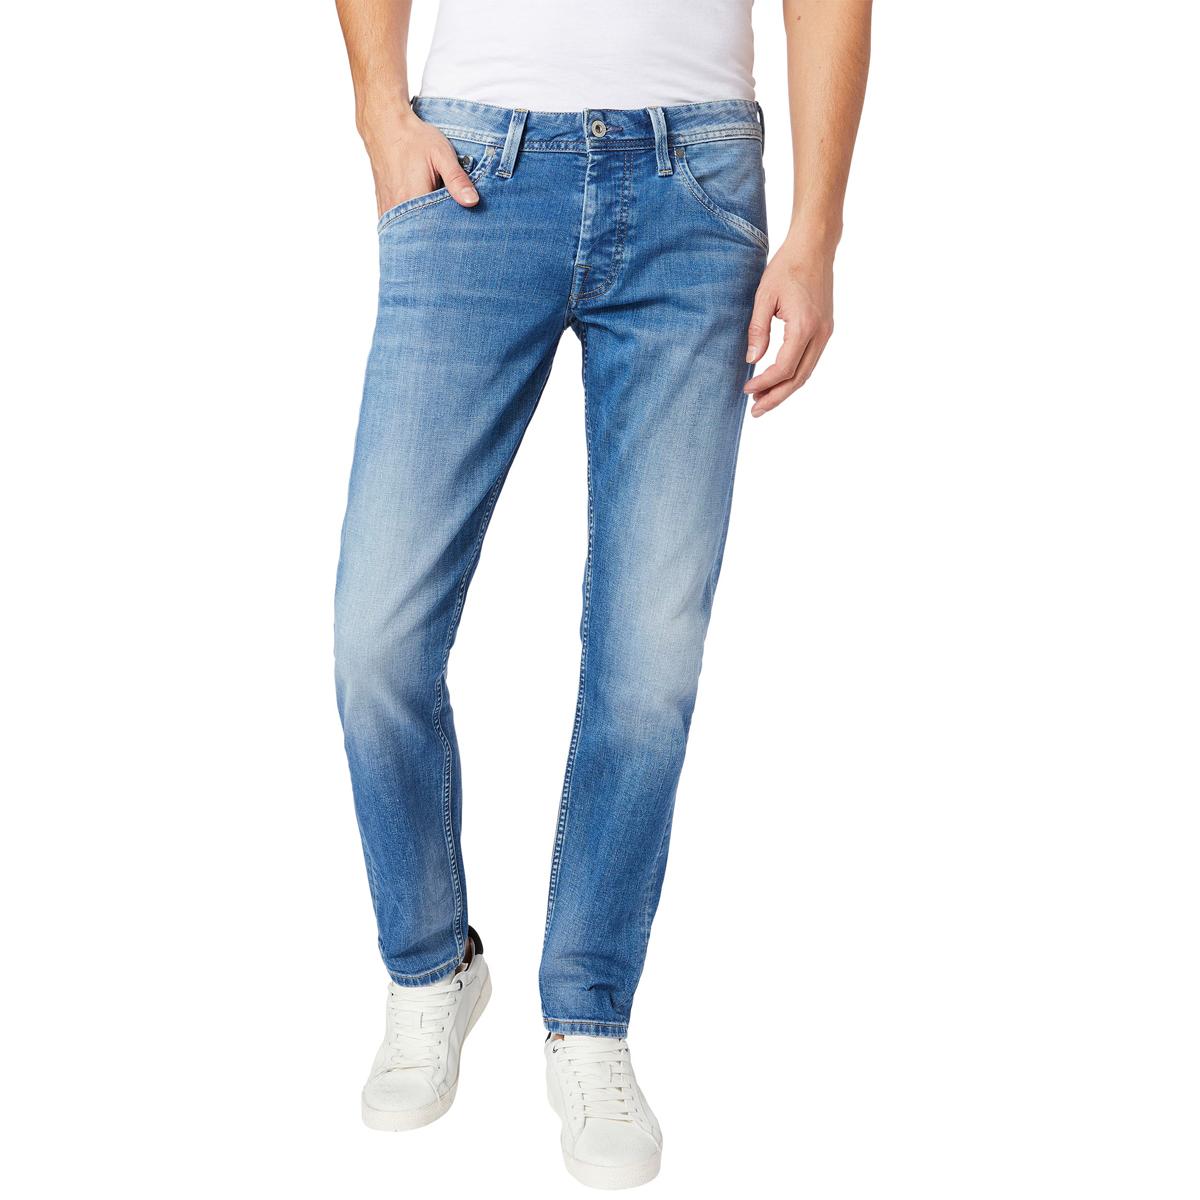 Джинсы мужские Pepe Jeans Kolt, цвет: синий. 097.PM201053.GC9.000. Размер 36-32 (52-32)